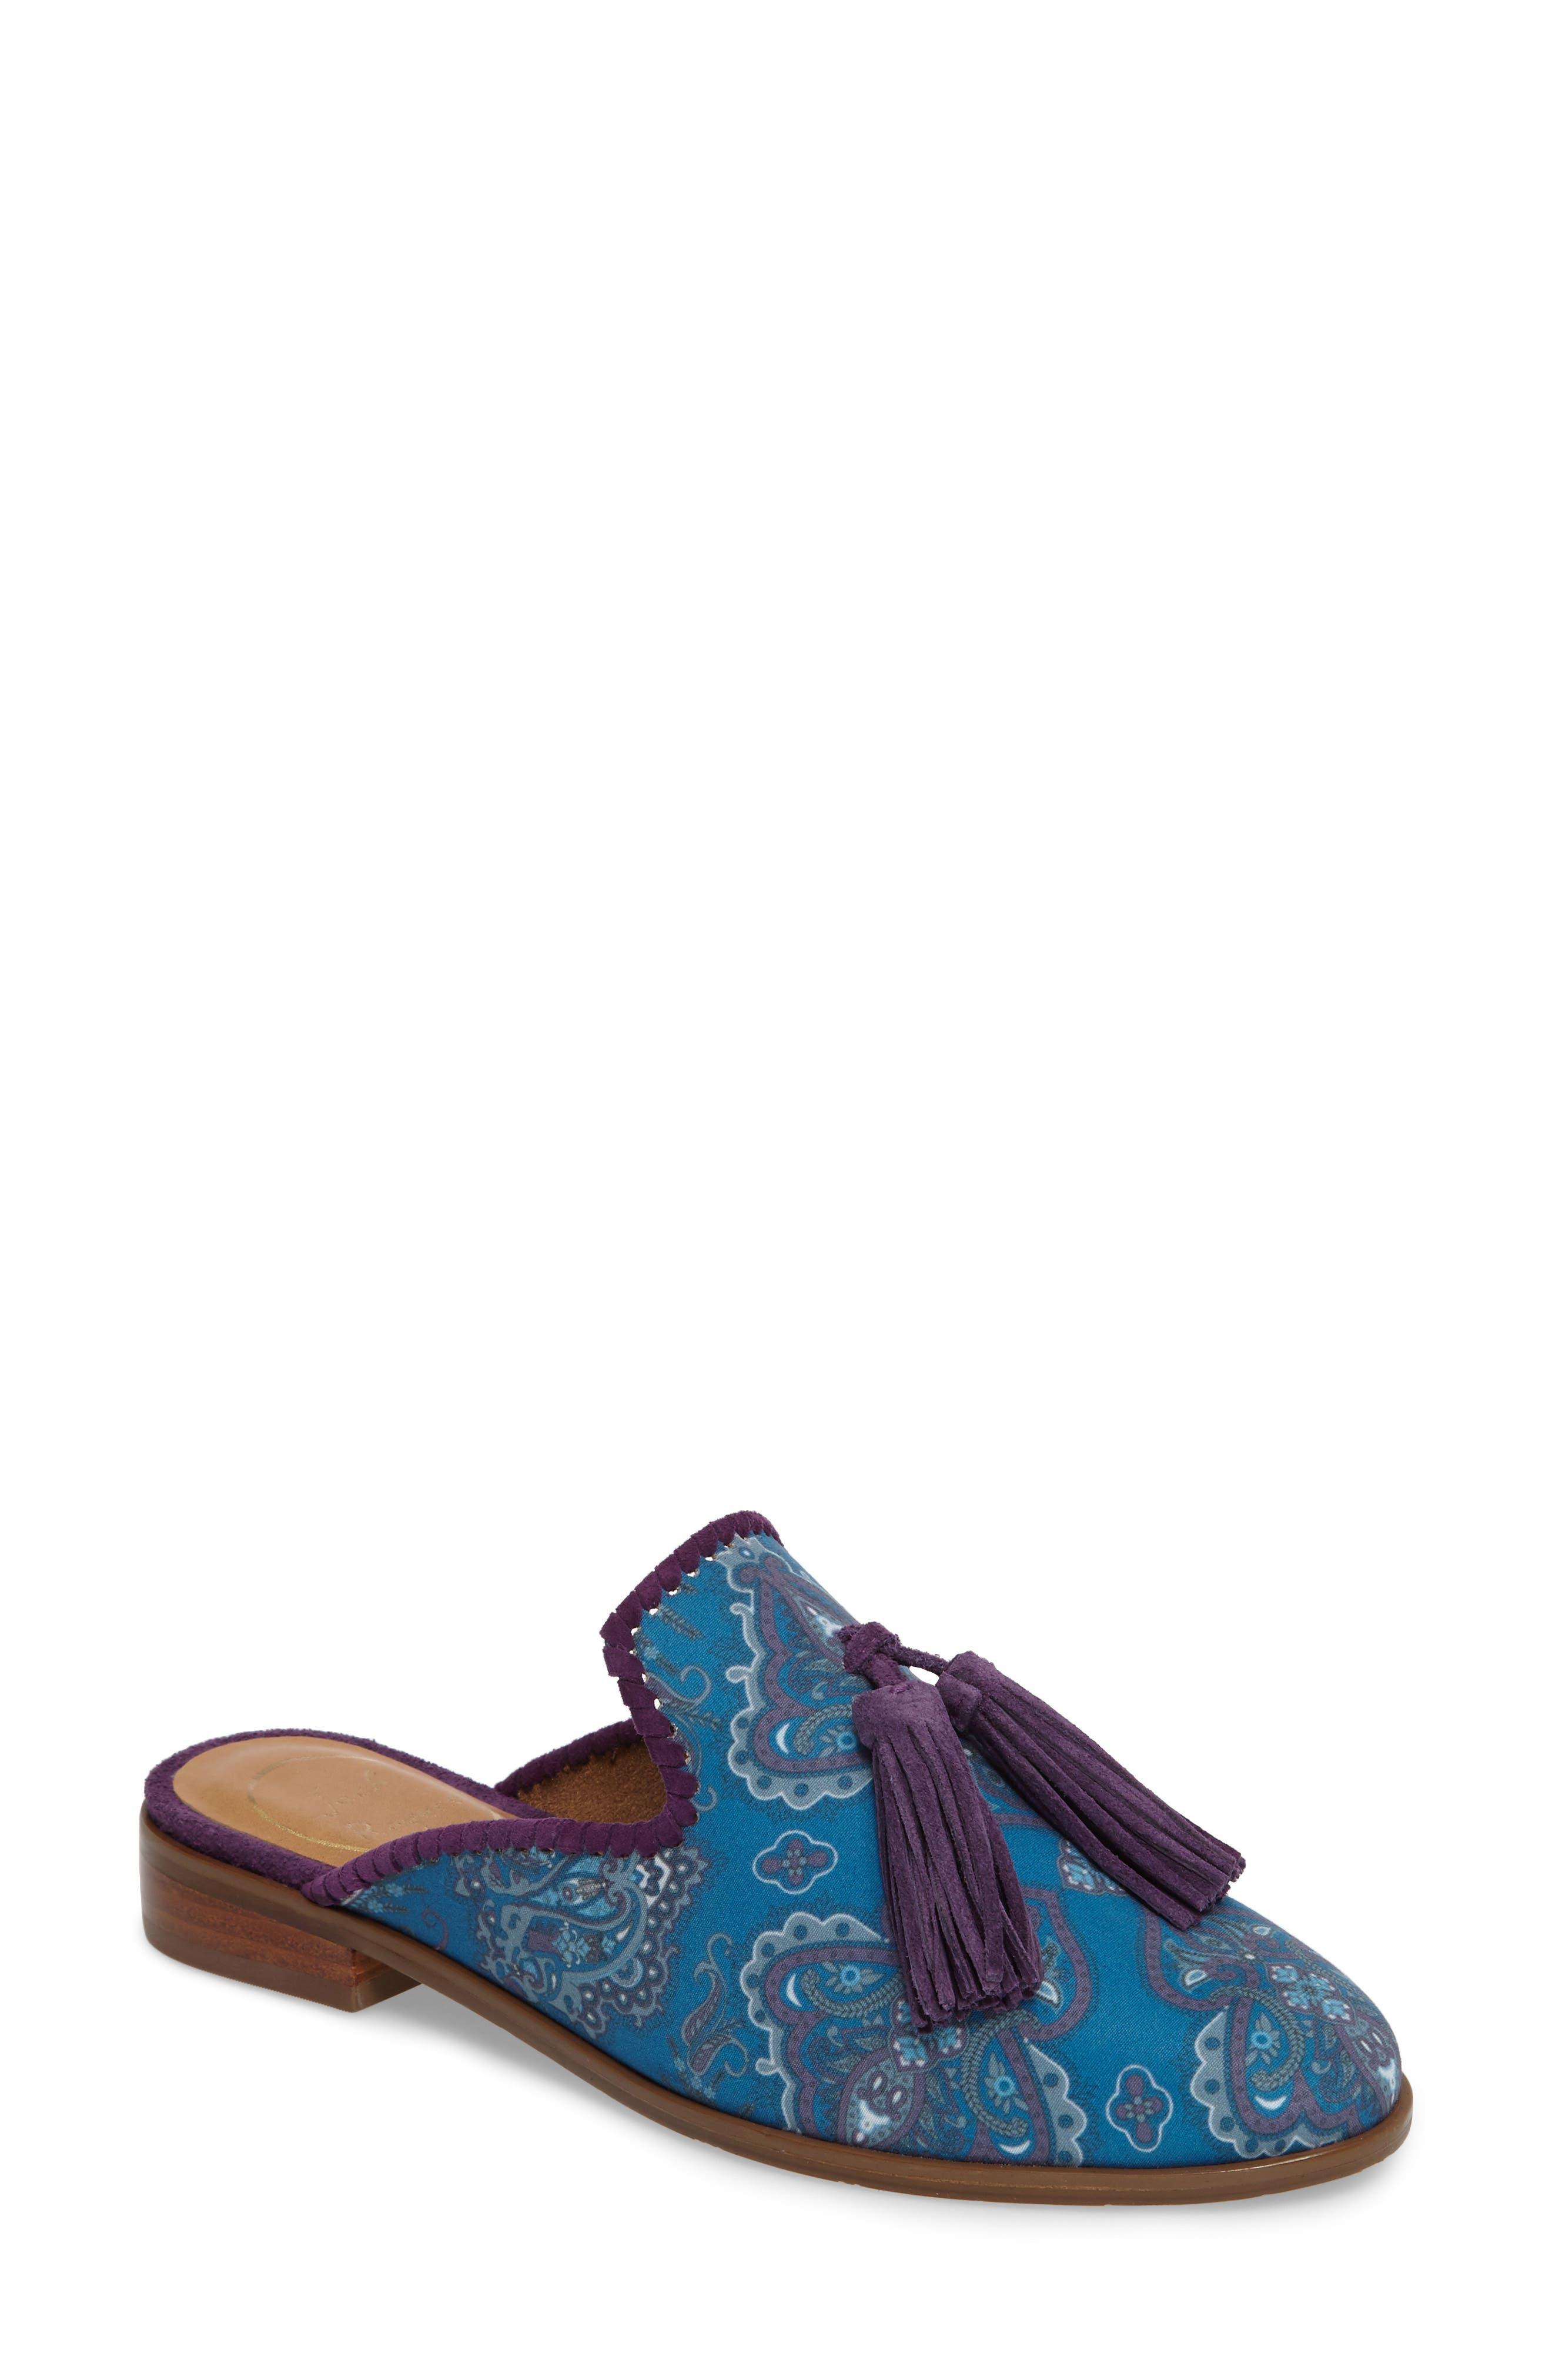 Delaney Tassel Mule,                         Main,                         color, Blue Paisley Fabric